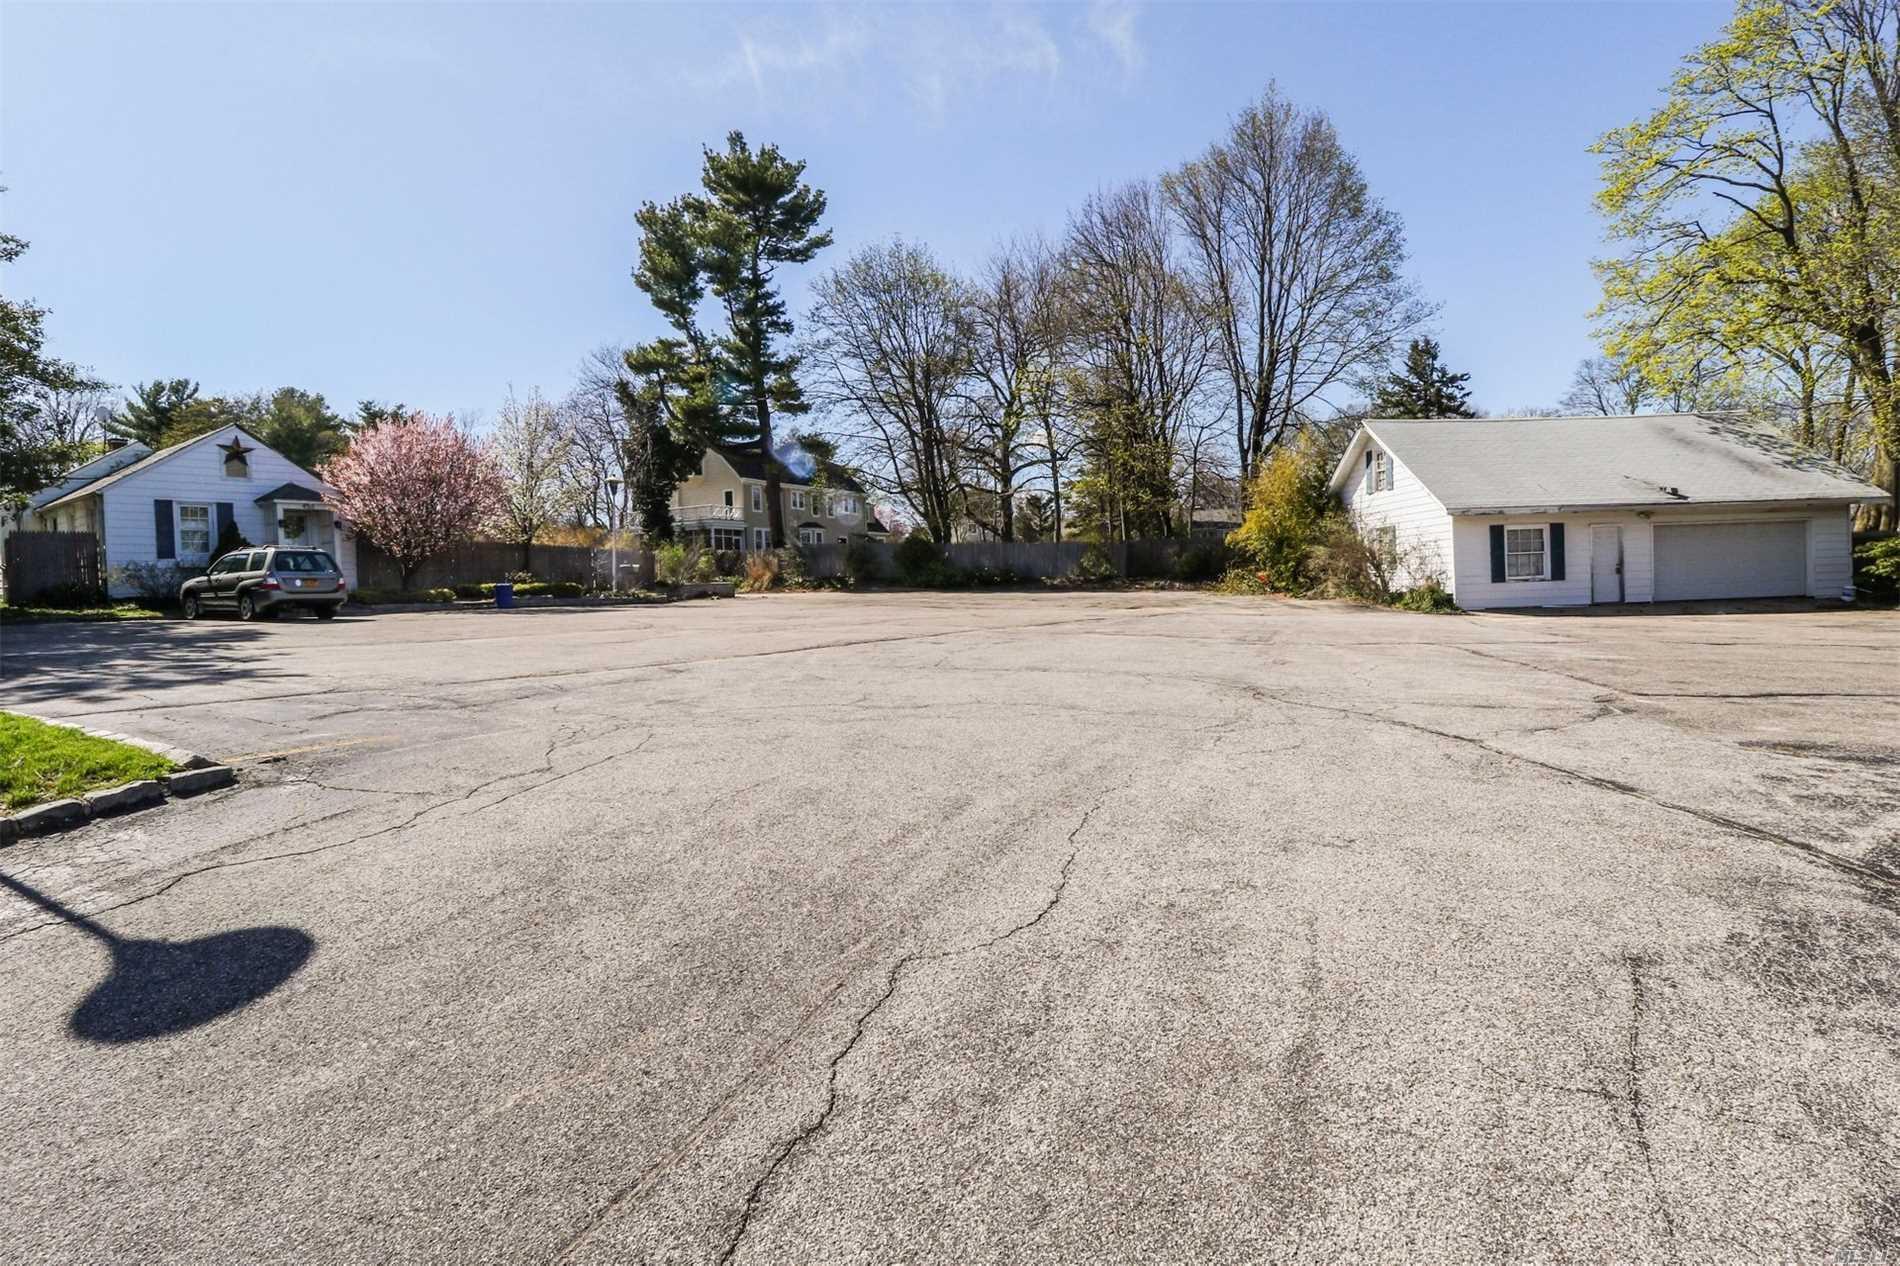 Photo of home for sale at 449 Main St W, Huntington NY